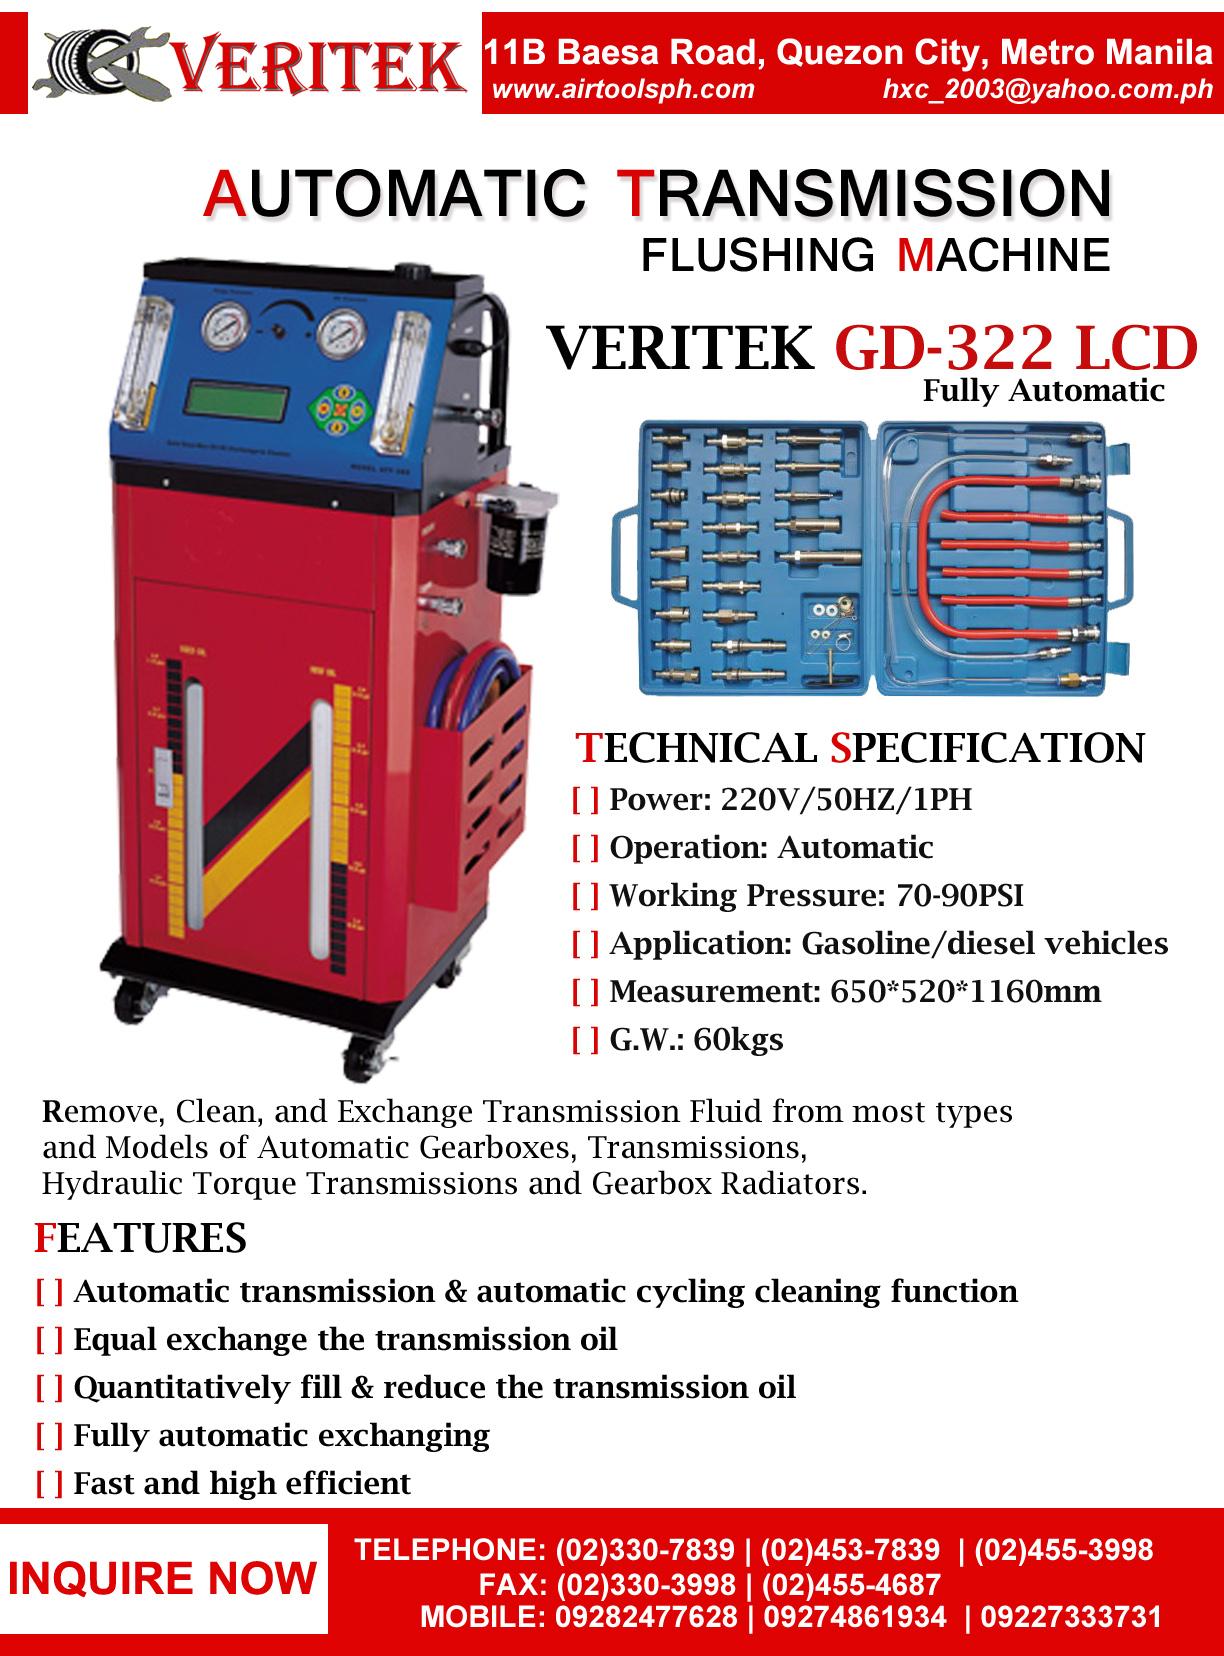 92500 transmission fluid exchanger,advantage transmission fluid exchanger,auto transmission fluid exchange cost,